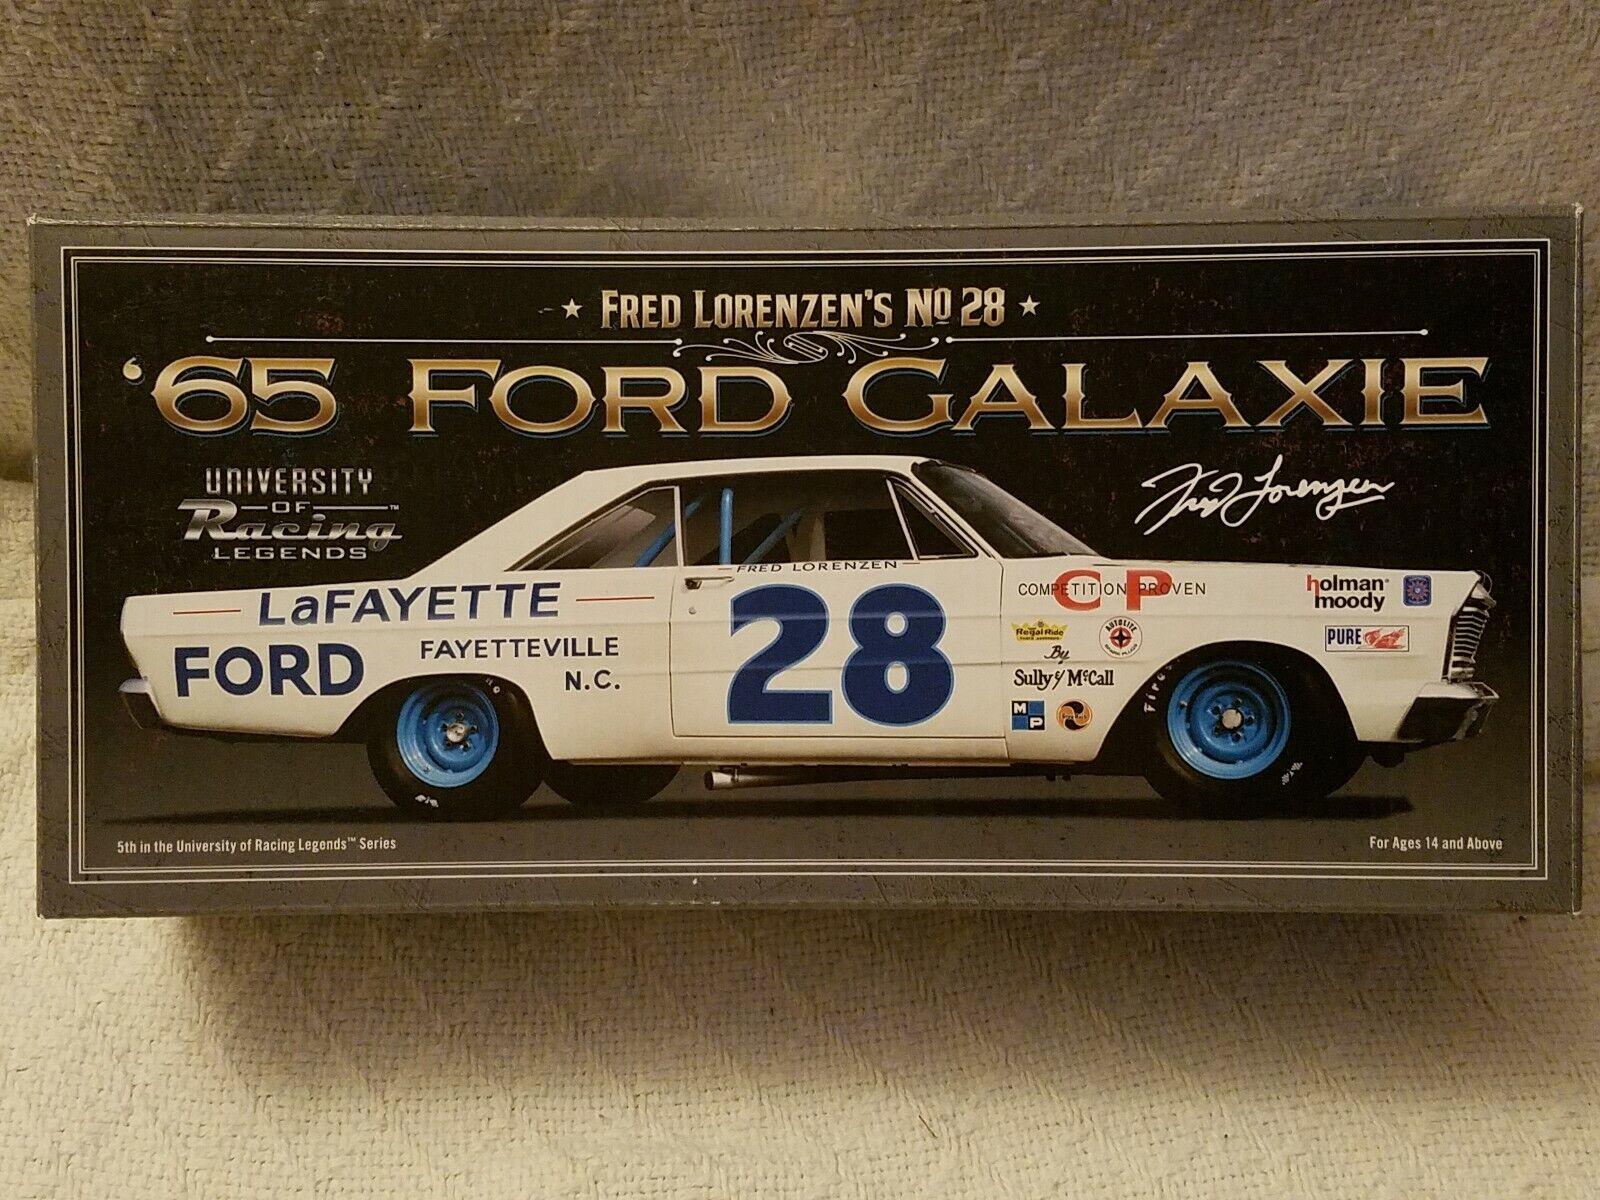 1 24 F. Lorenzen  28 1965 FORD GALAXIE University of Racing Legends dédicacé